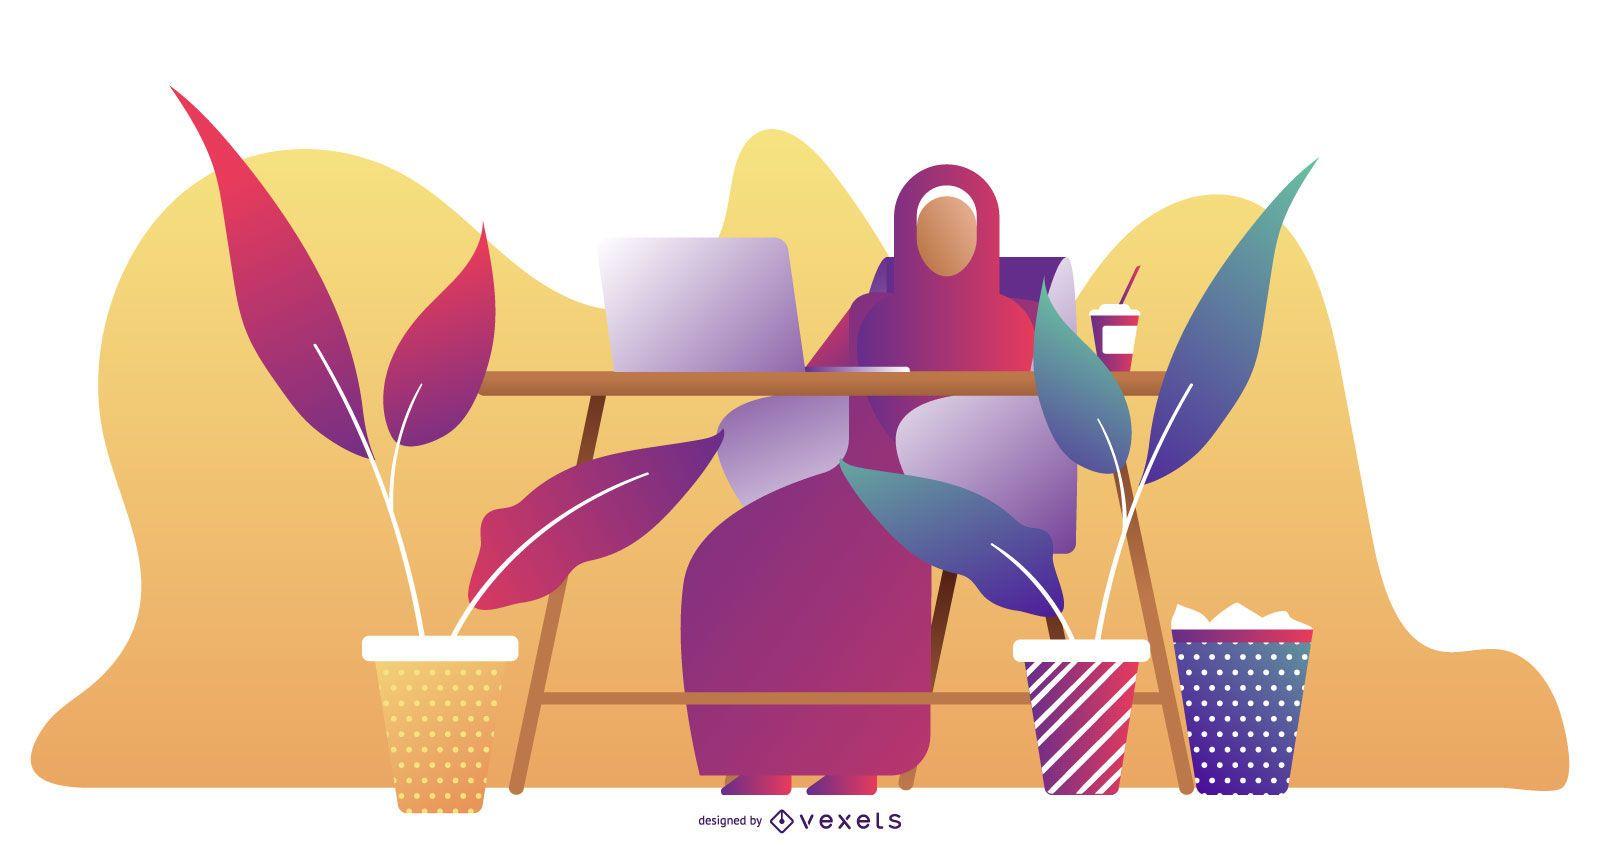 Arab Woman Illustration Design